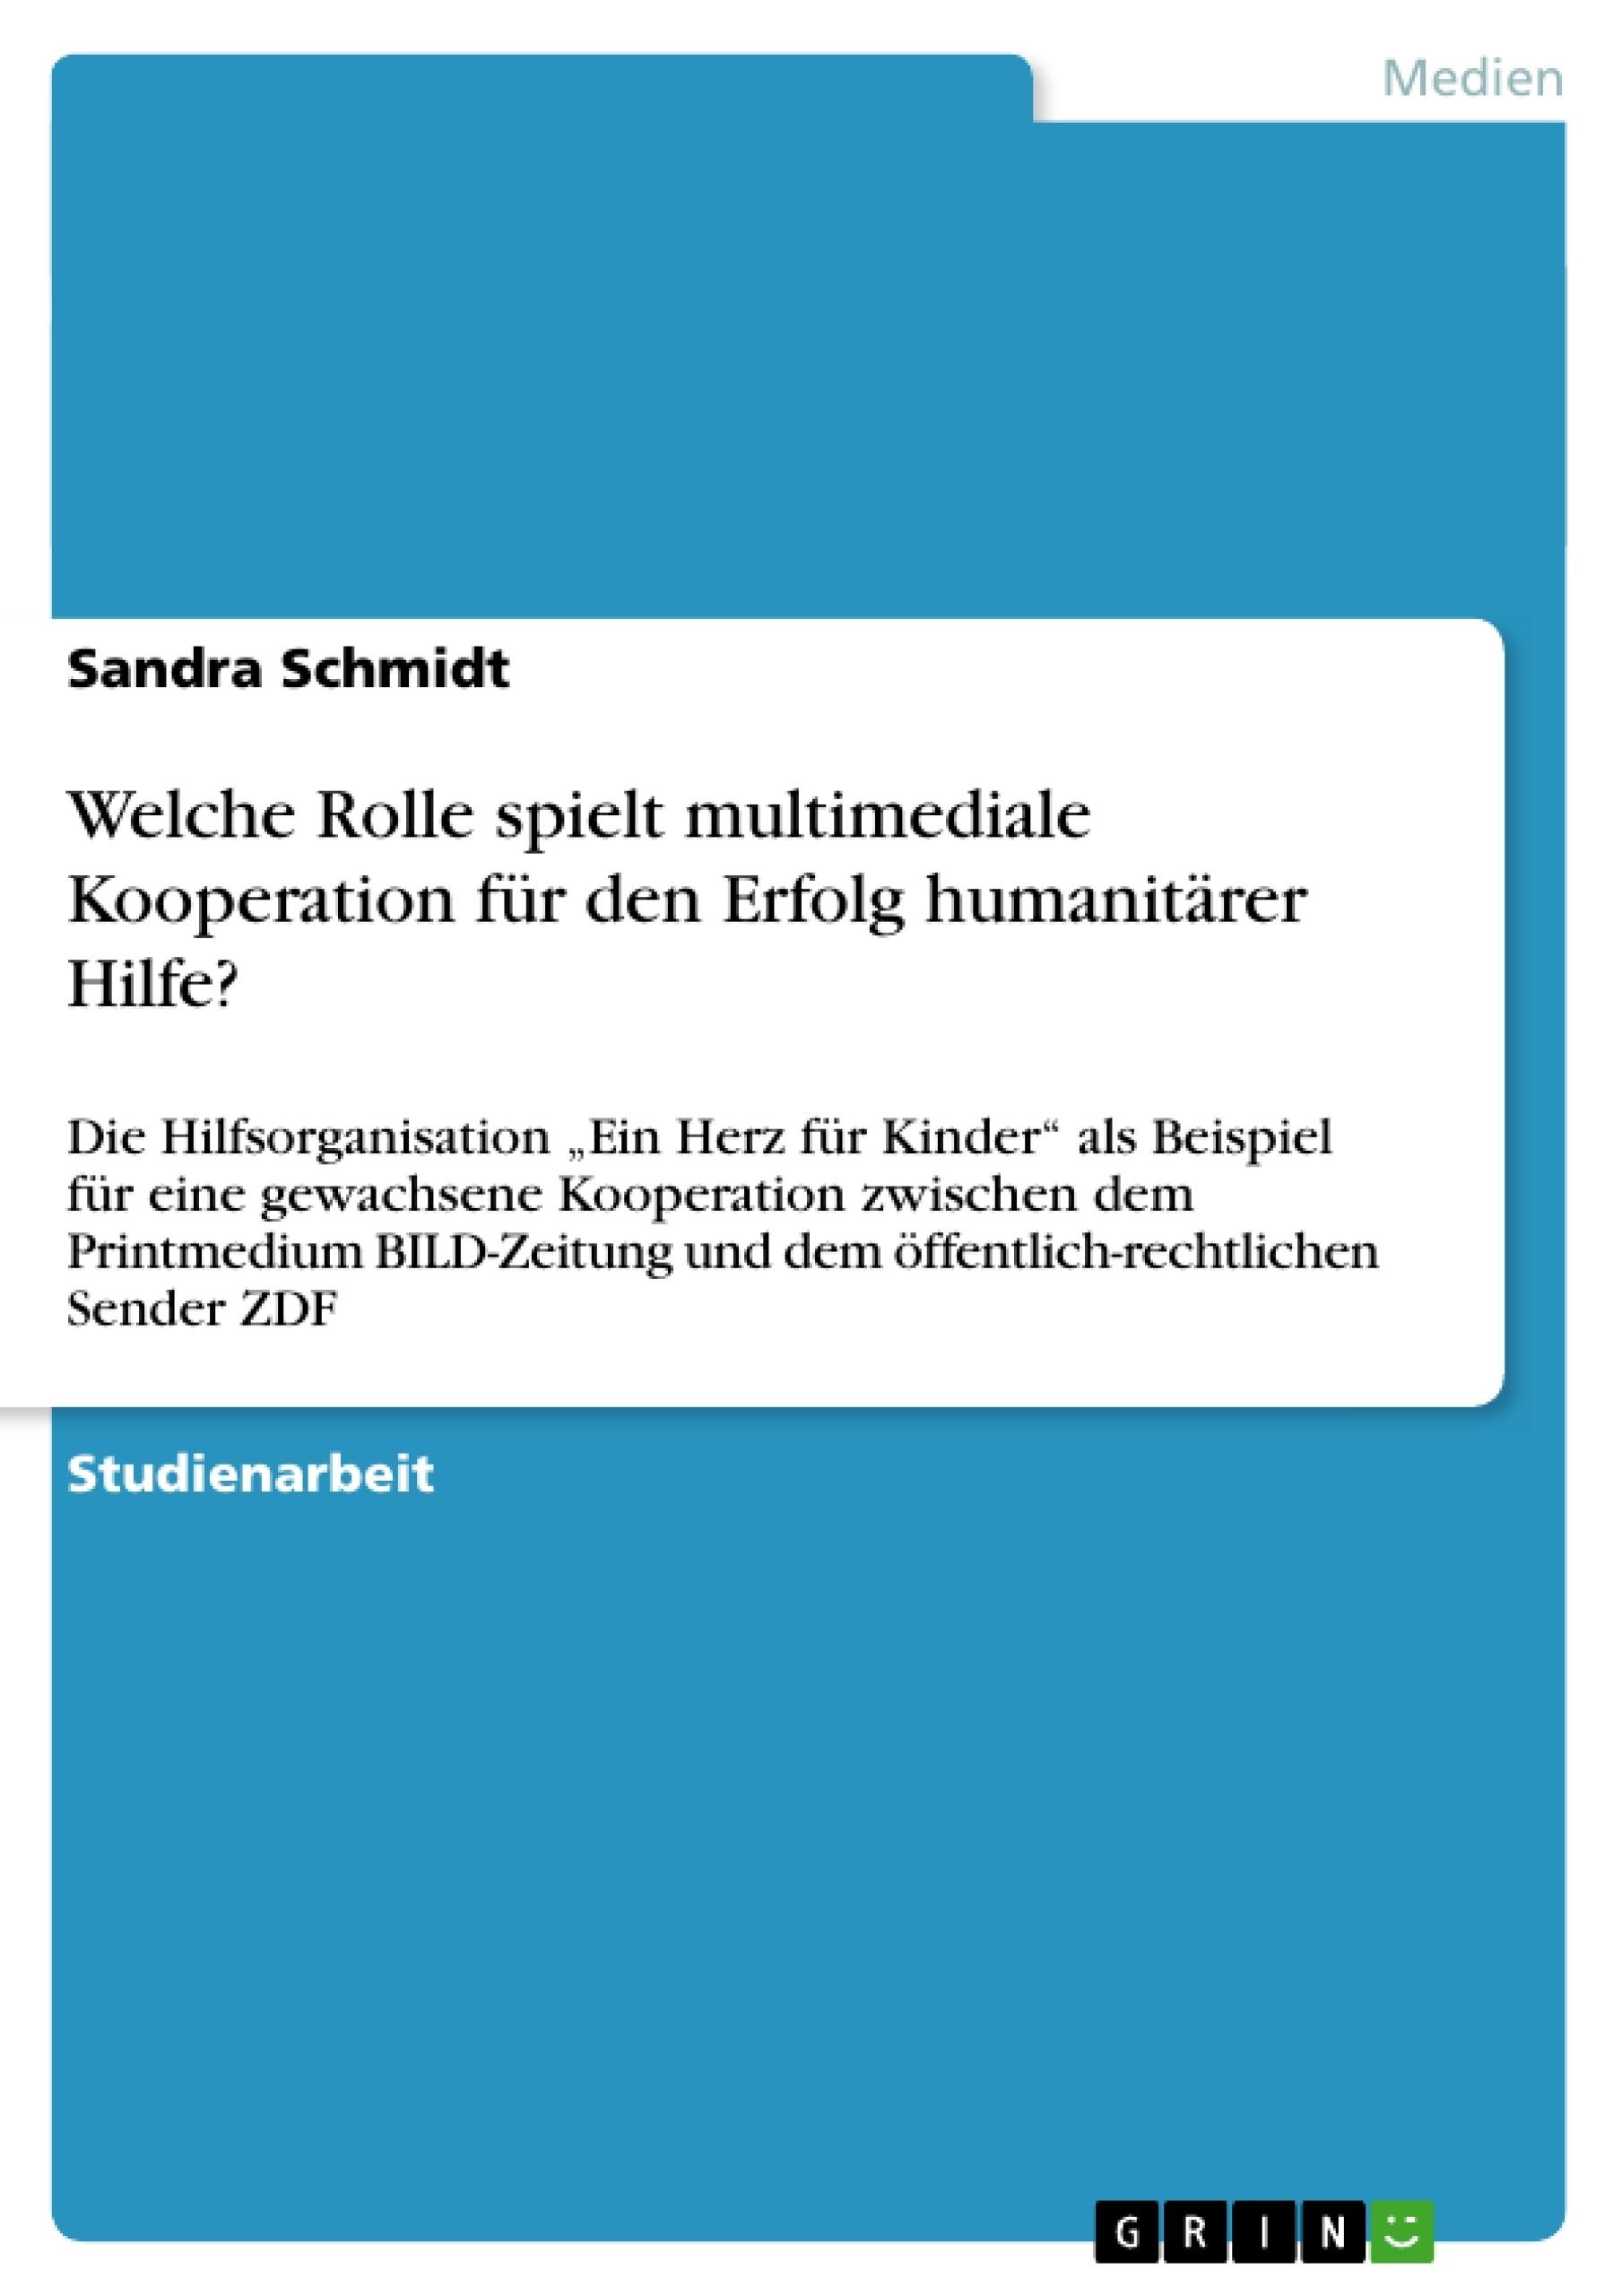 Titel: Welche Rolle spielt multimediale Kooperation für den Erfolg humanitärer Hilfe?